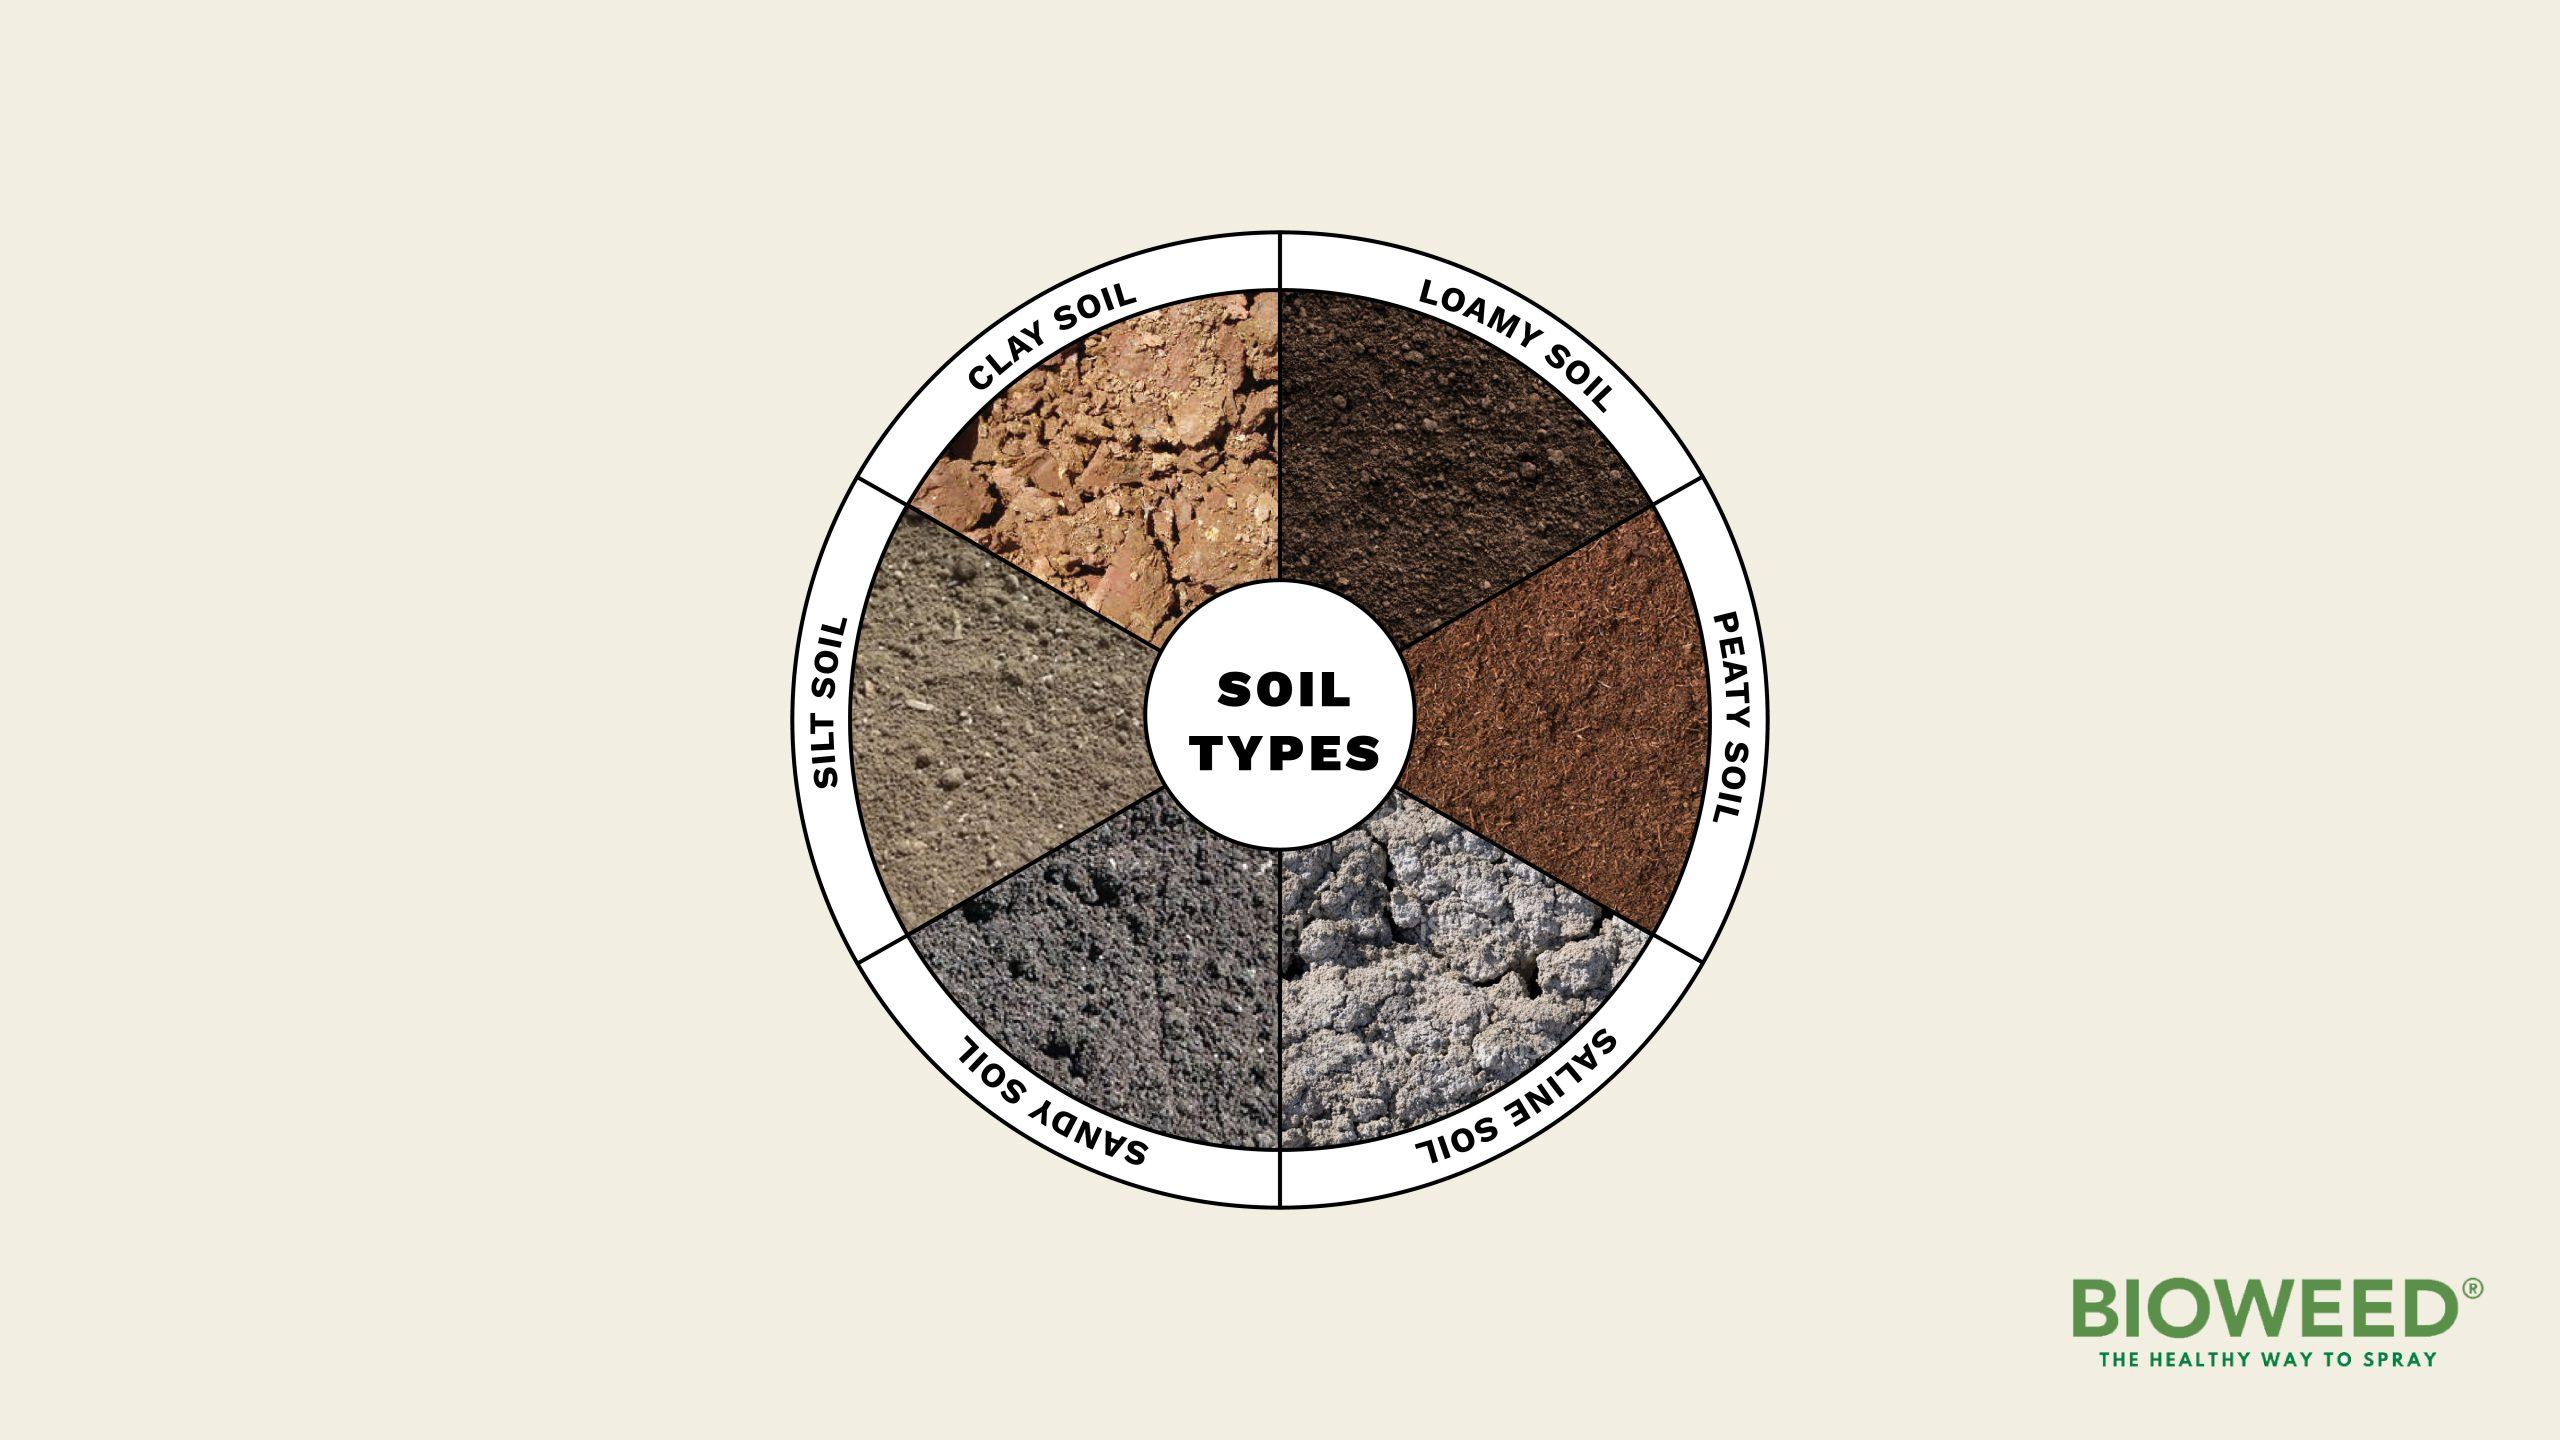 6-common-soil-types